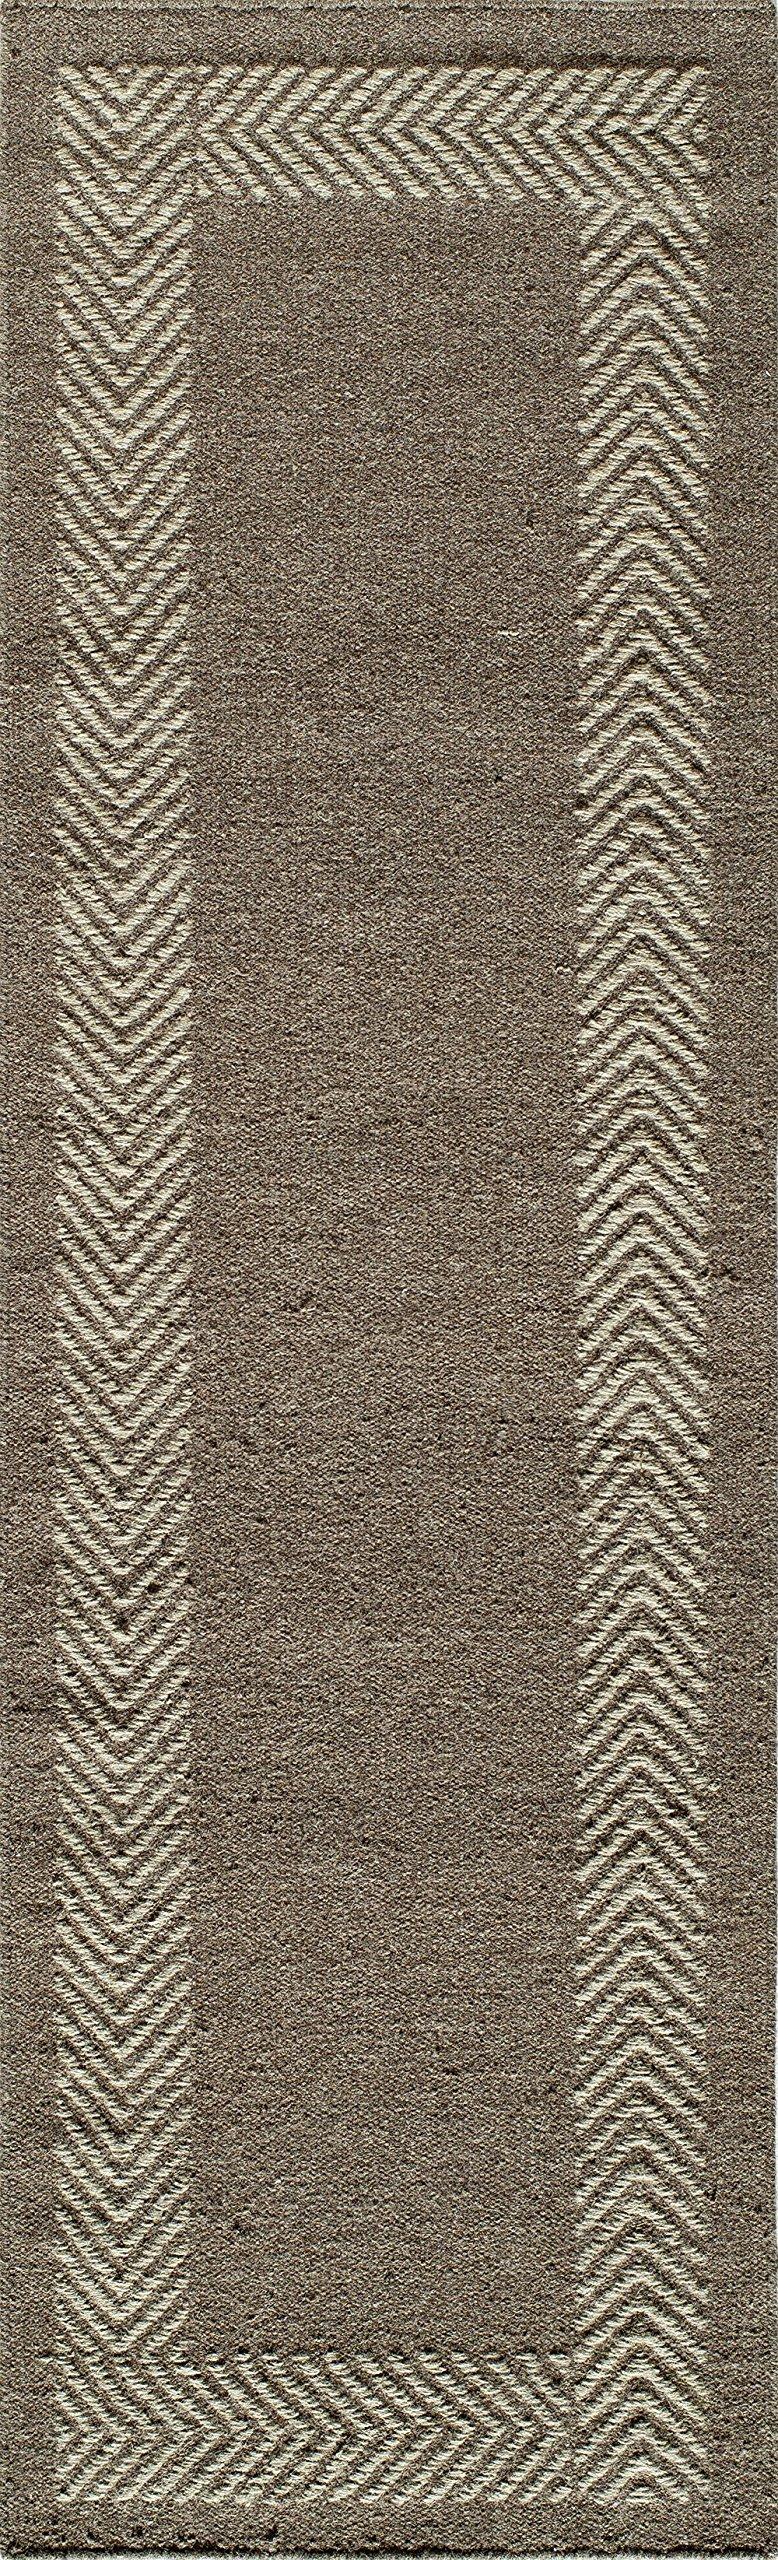 Momeni Rugs MESA0MES-8NAT2380 Mesa Collection, 100% Wool Hand Woven Flatweave Transitional Area Rug, 2'3'' x 8'3'' Runner, Natural Brown